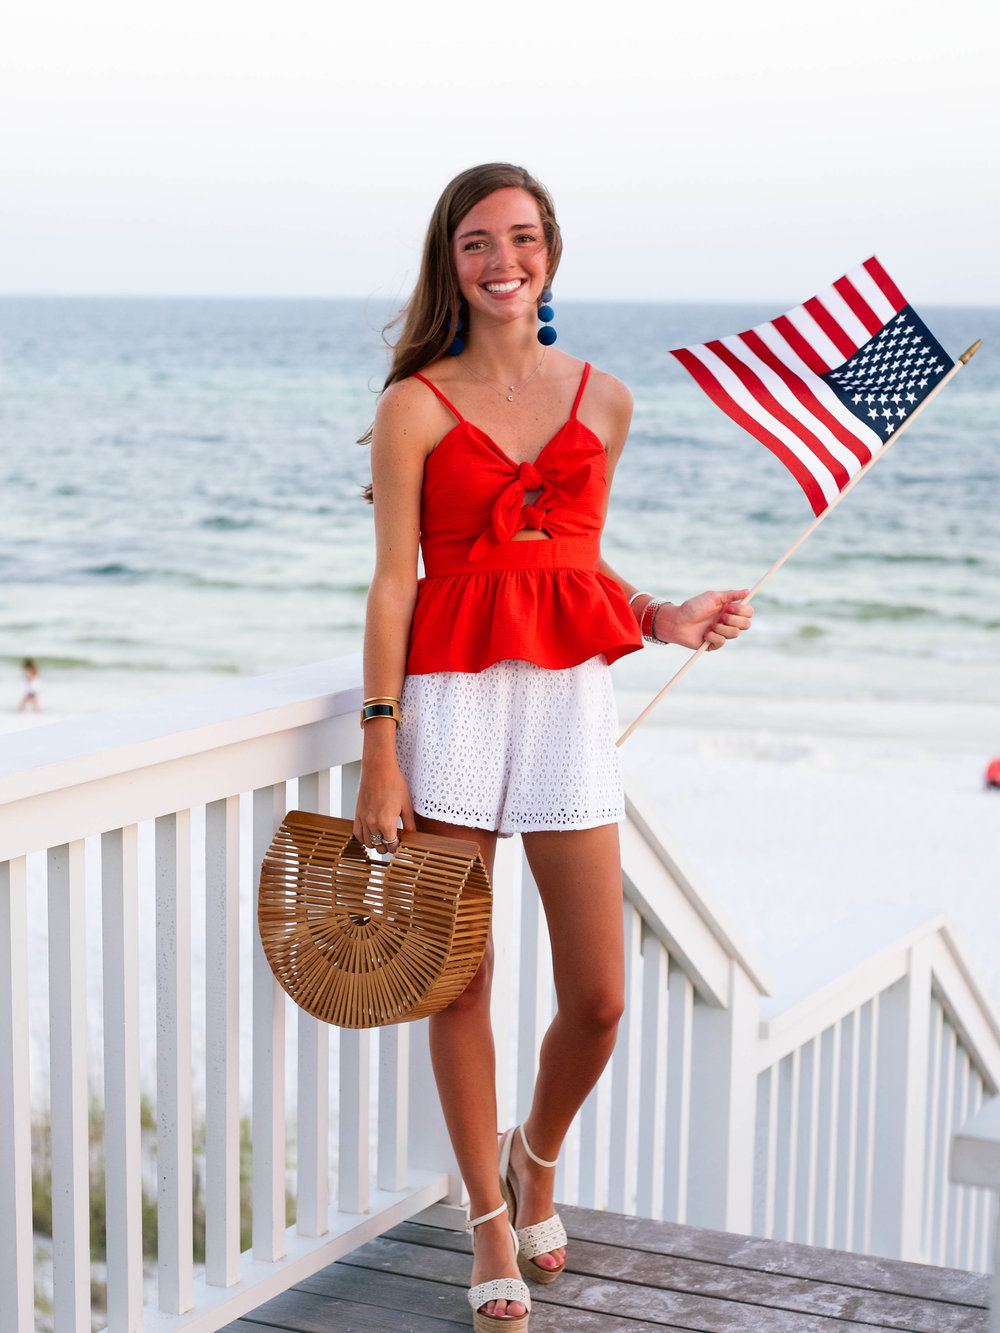 lcb style fashion blogger seaside florida beach fourth of july  (27 of 28) copy.jpg